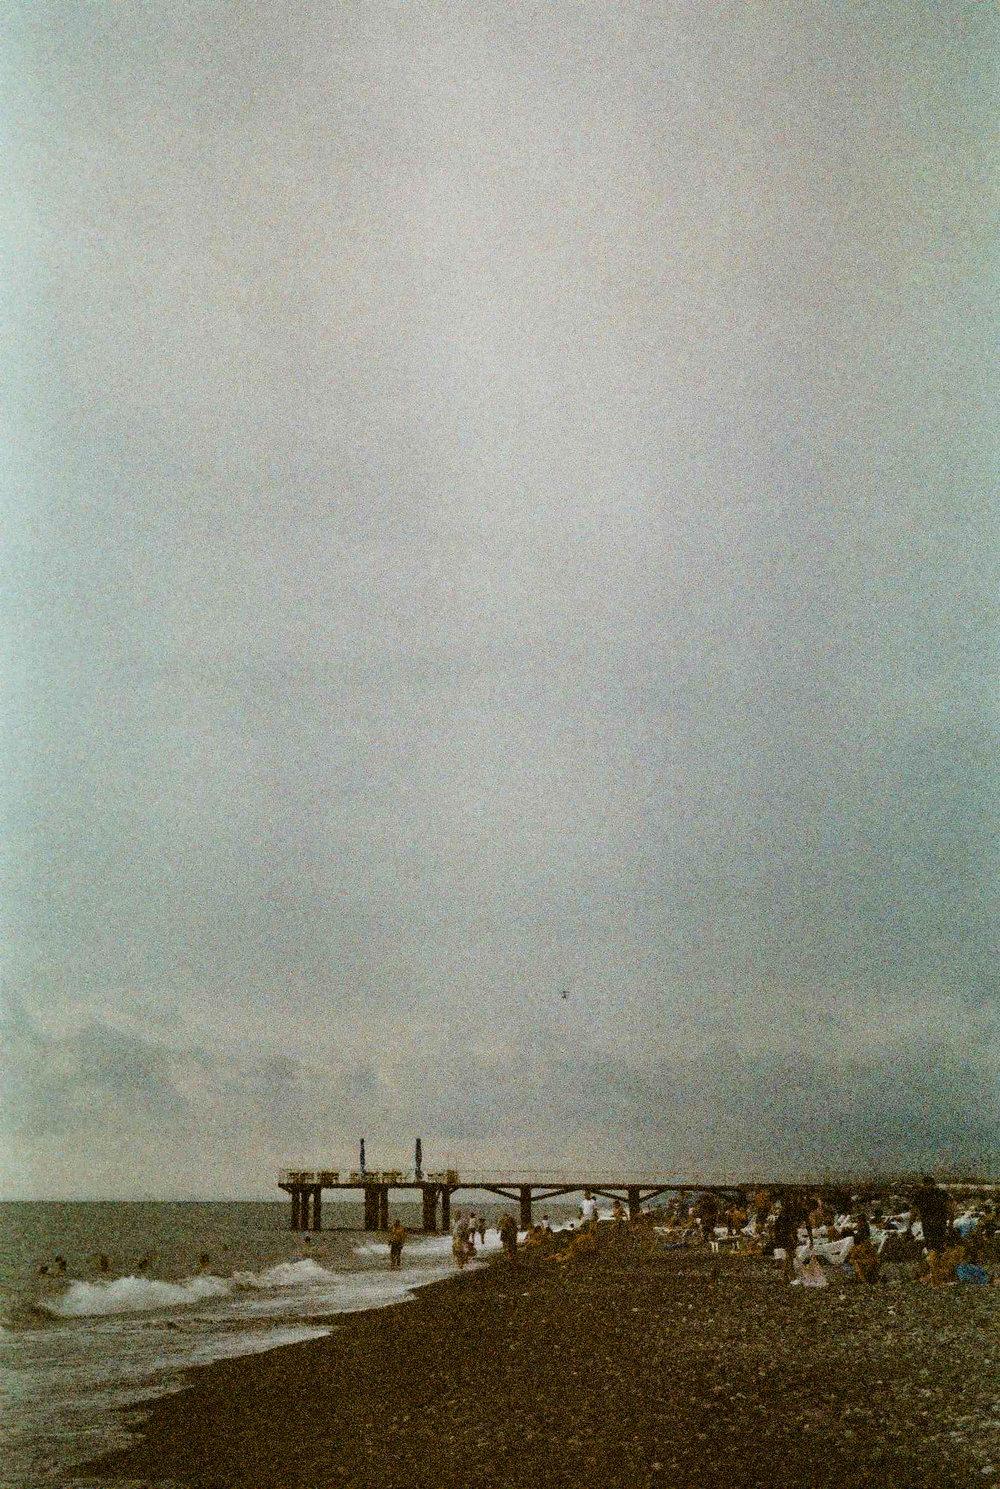 r001-013-4.jpg